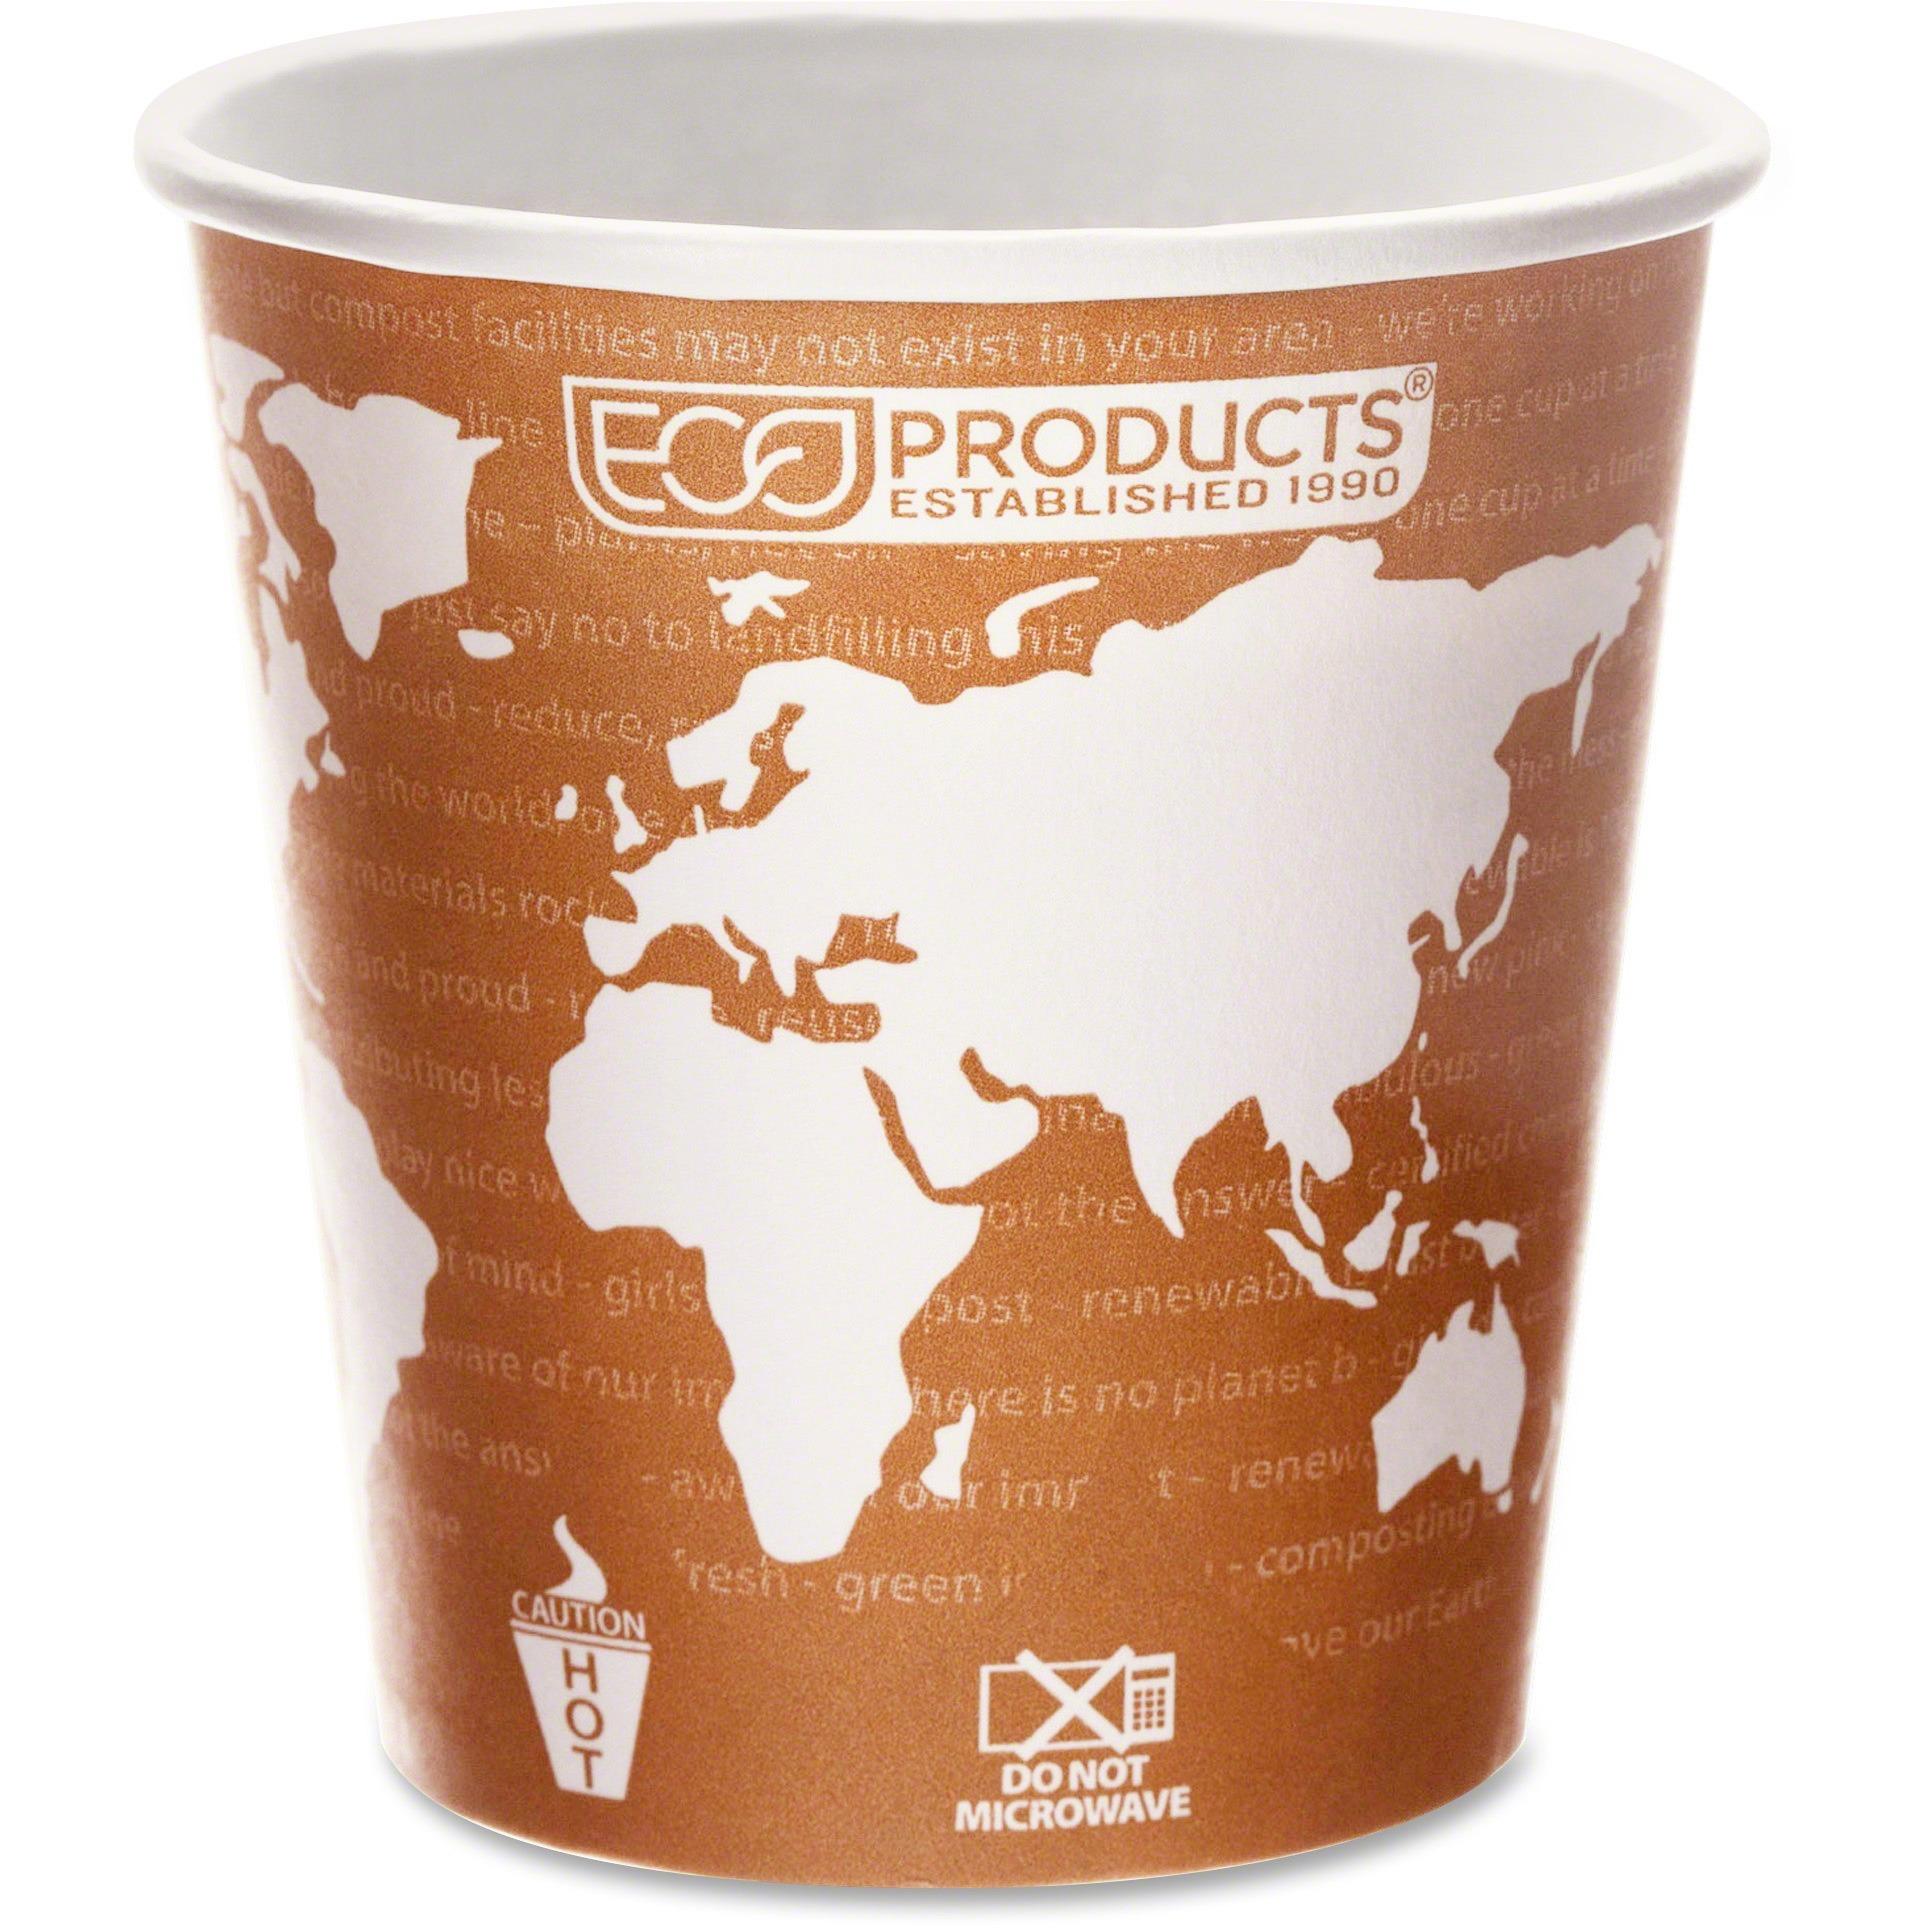 Eco-Products, ECOEPBHC10WA, World Art Hot Beverage Cups, 1000 / Carton, Multi, 10 fl oz